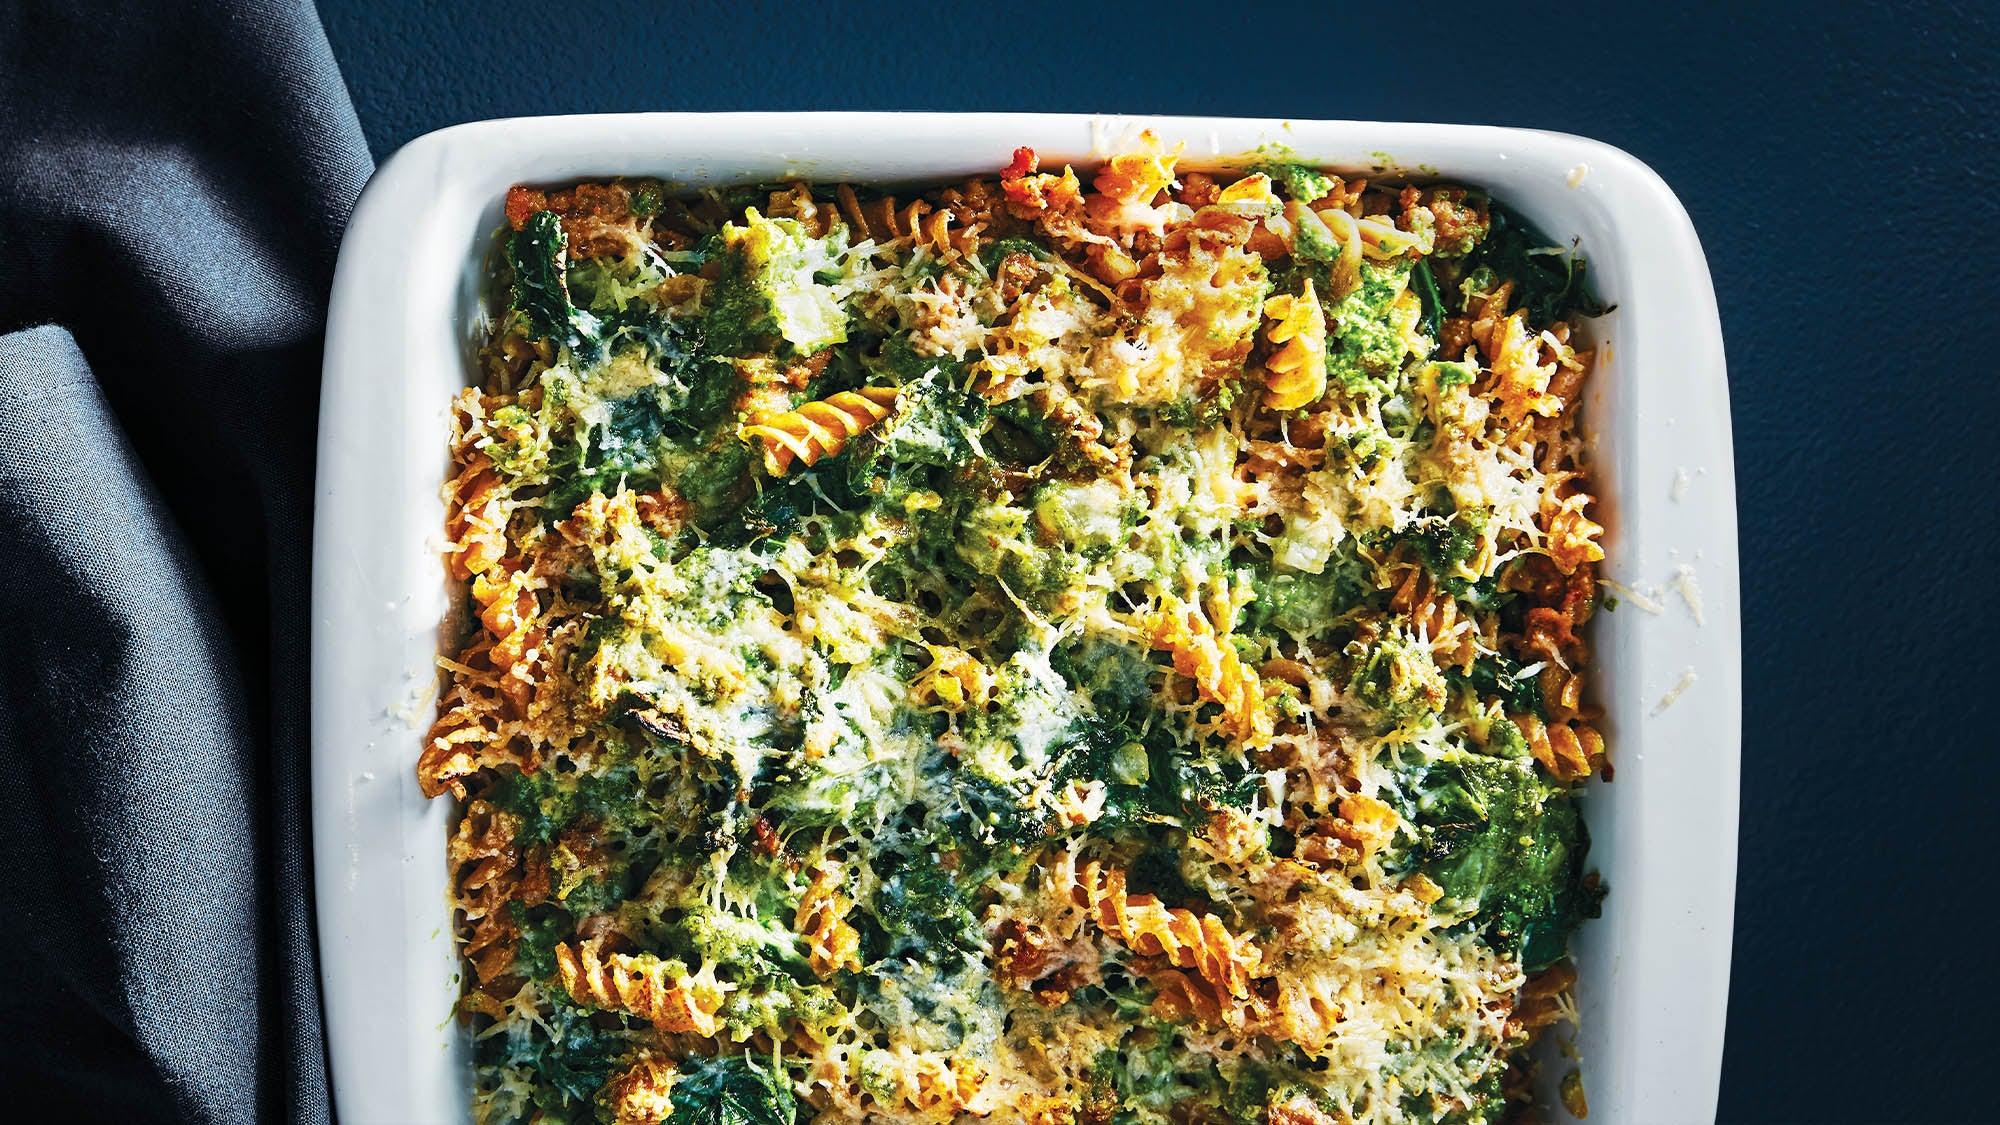 Kale and Sausage Fusili Bake recipe